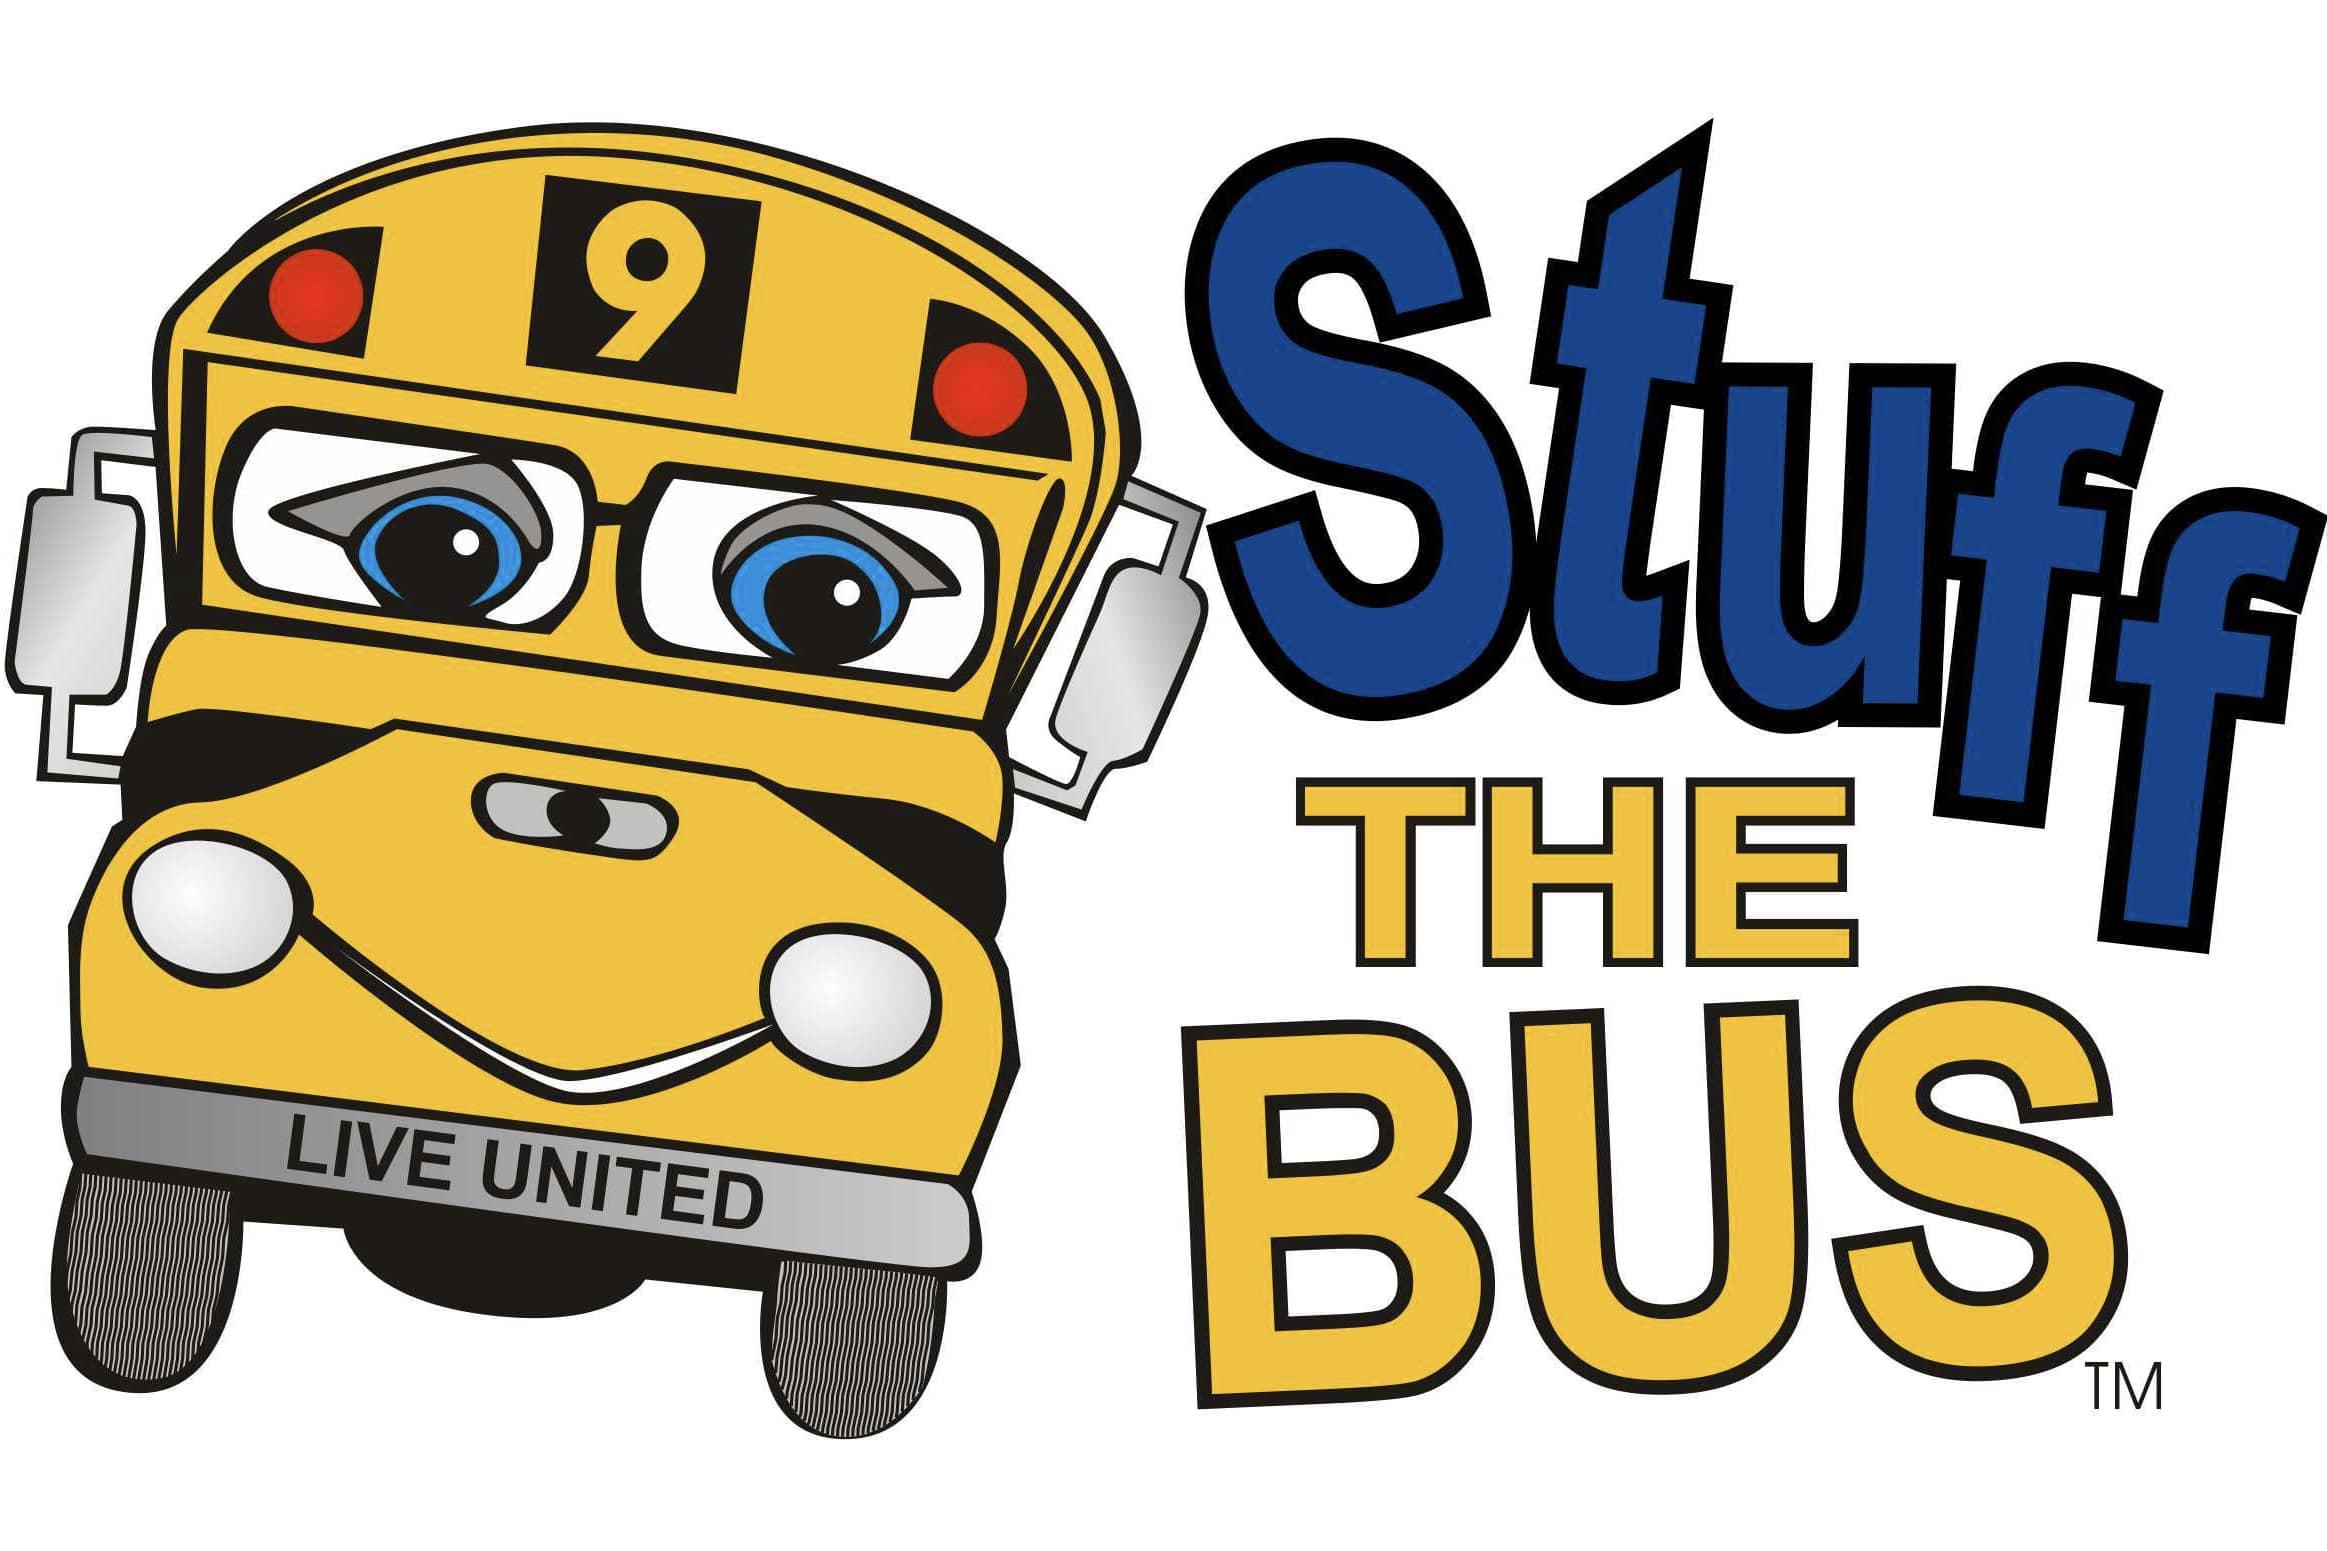 11x17-Stuff-the-Bus-2013